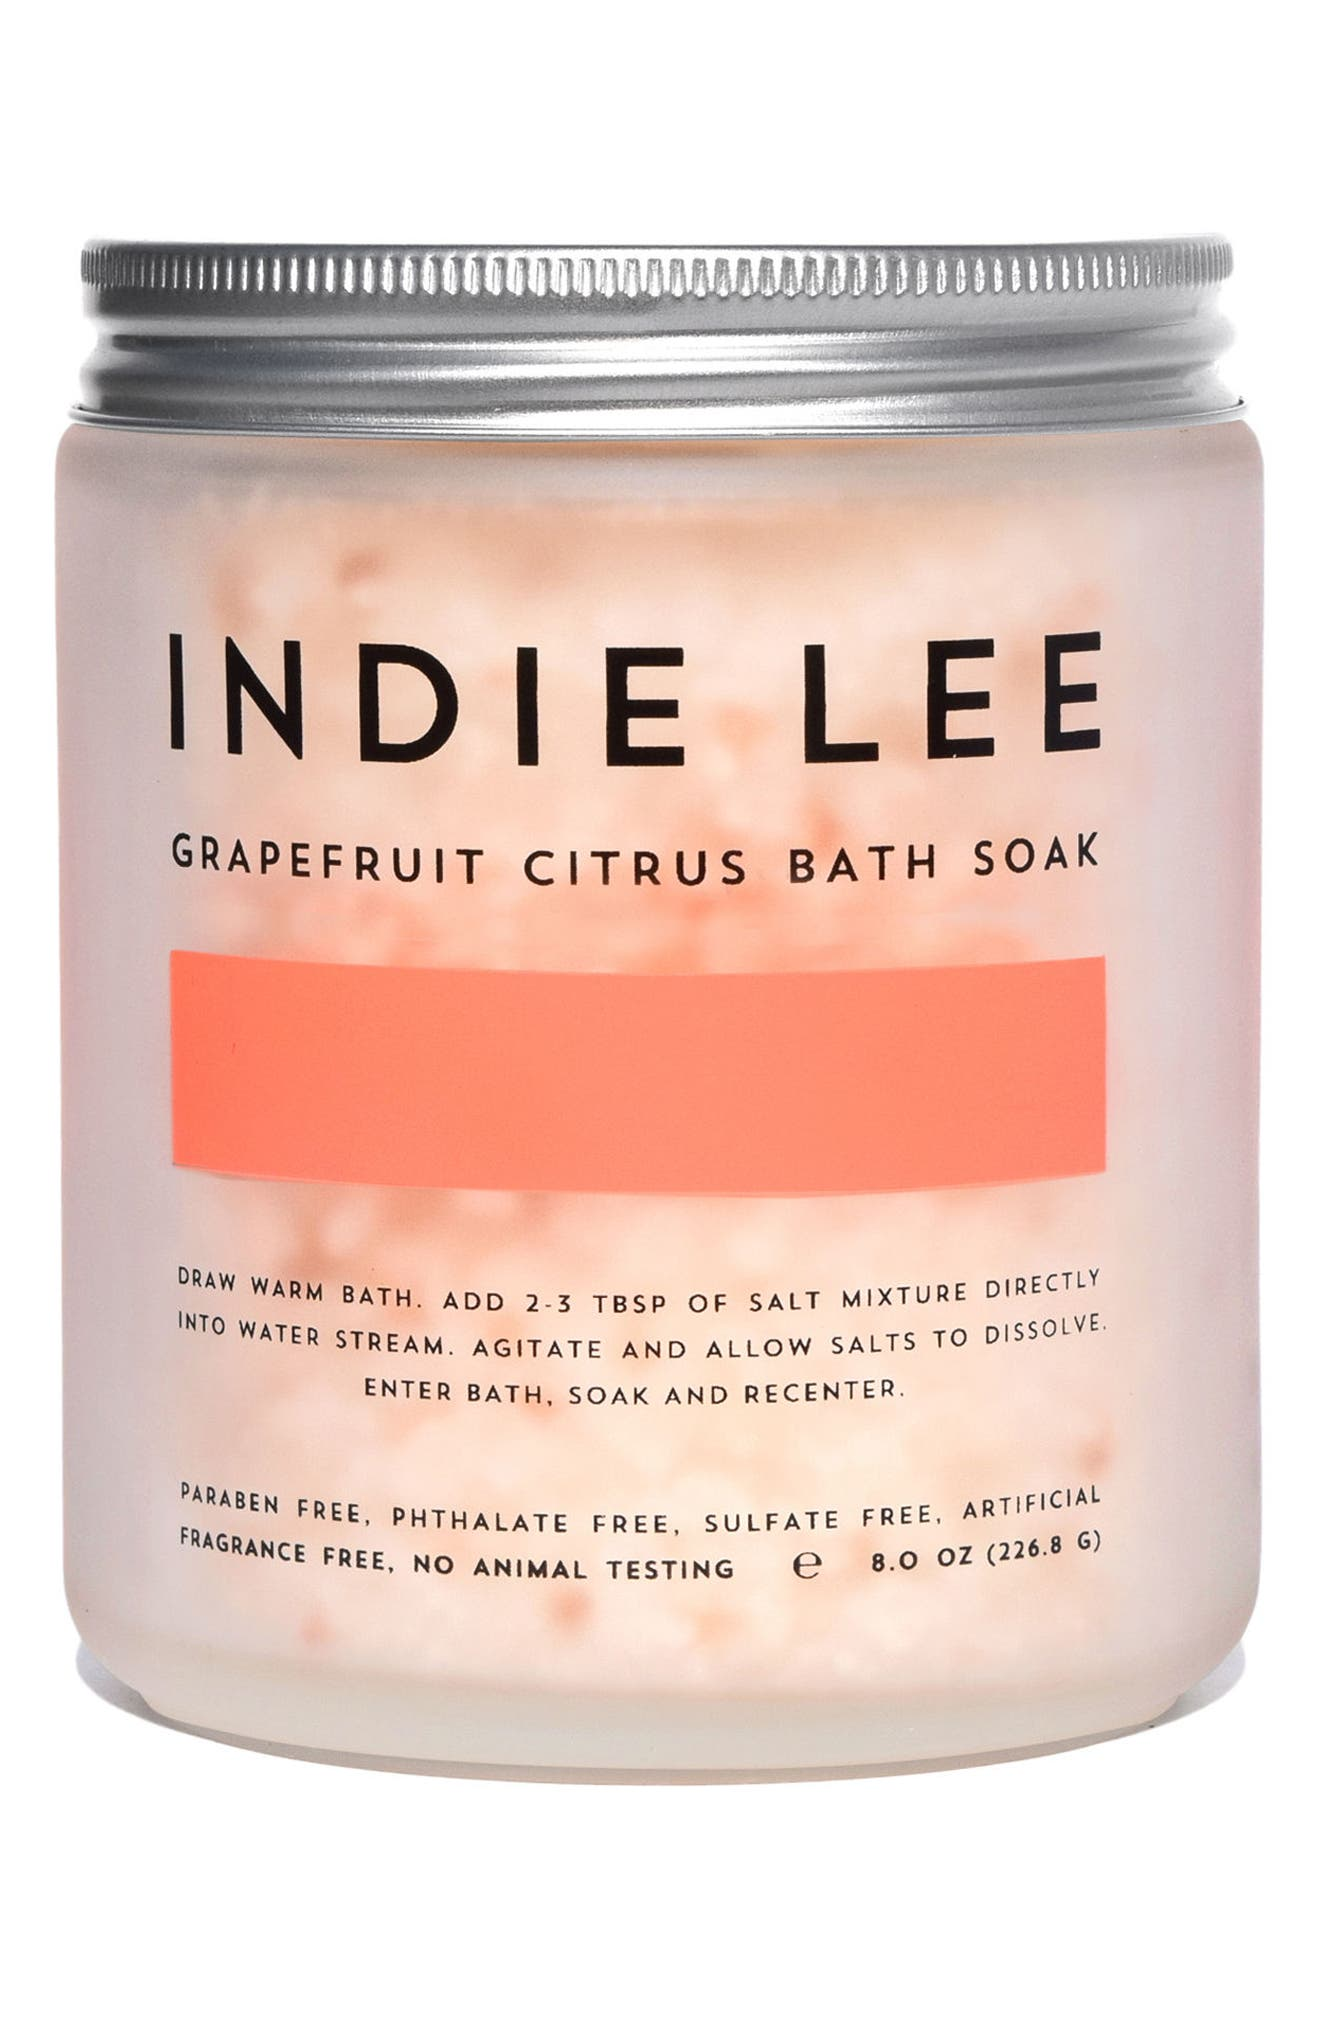 Indie Lee Grapefruit Citrus Bath Soak